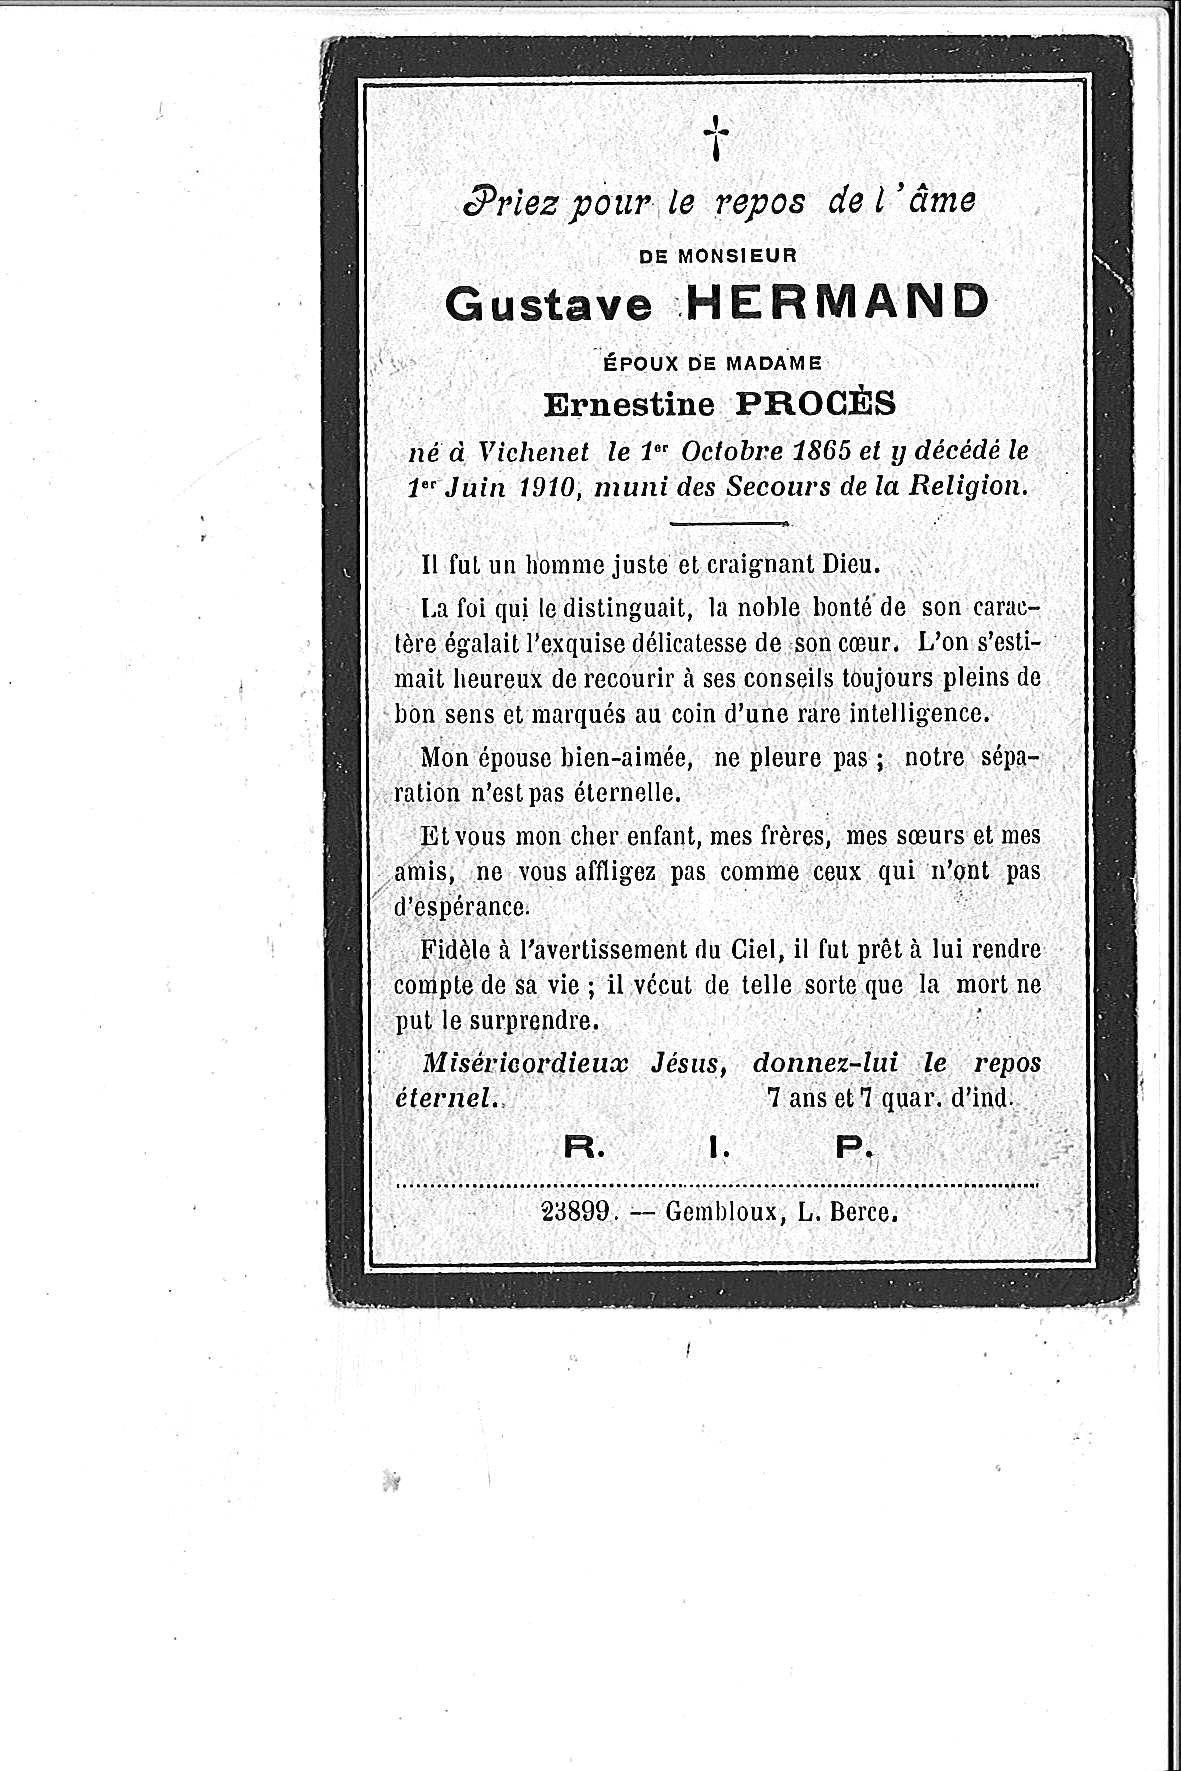 Gustave(1910)20150311141146_00009.jpg